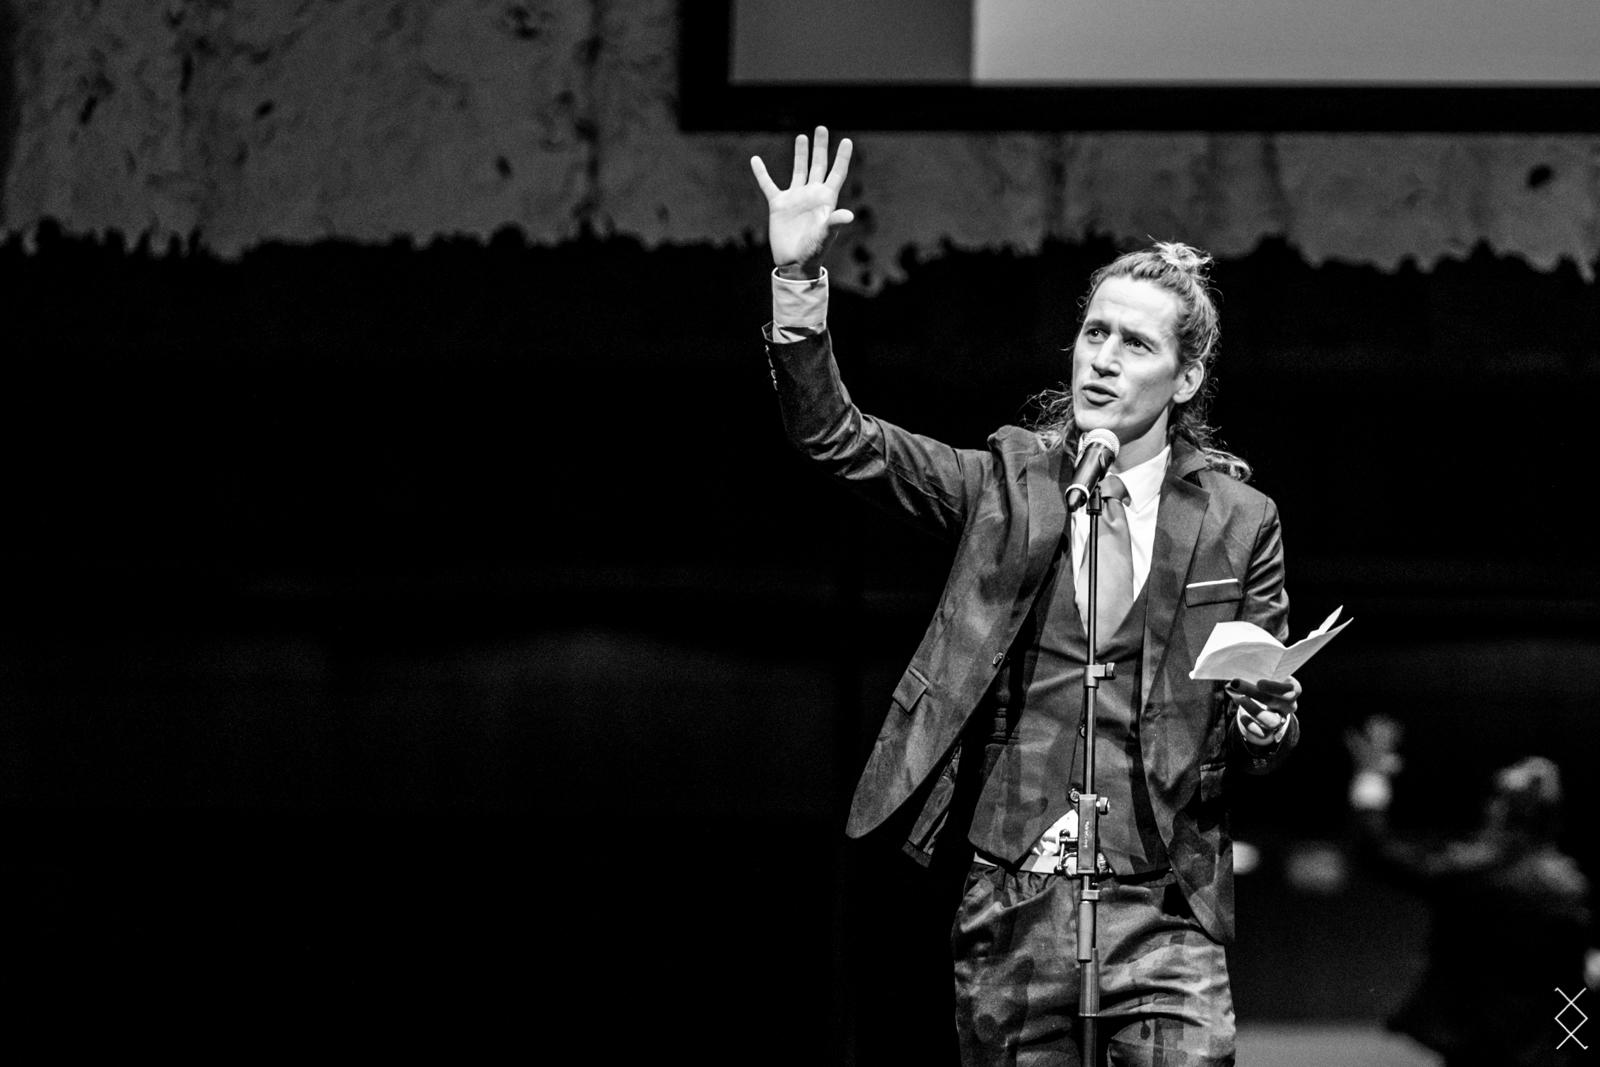 Jesse Laport, stadsdichter, musis, arnhem, spoken word, poetry, vers, suit.